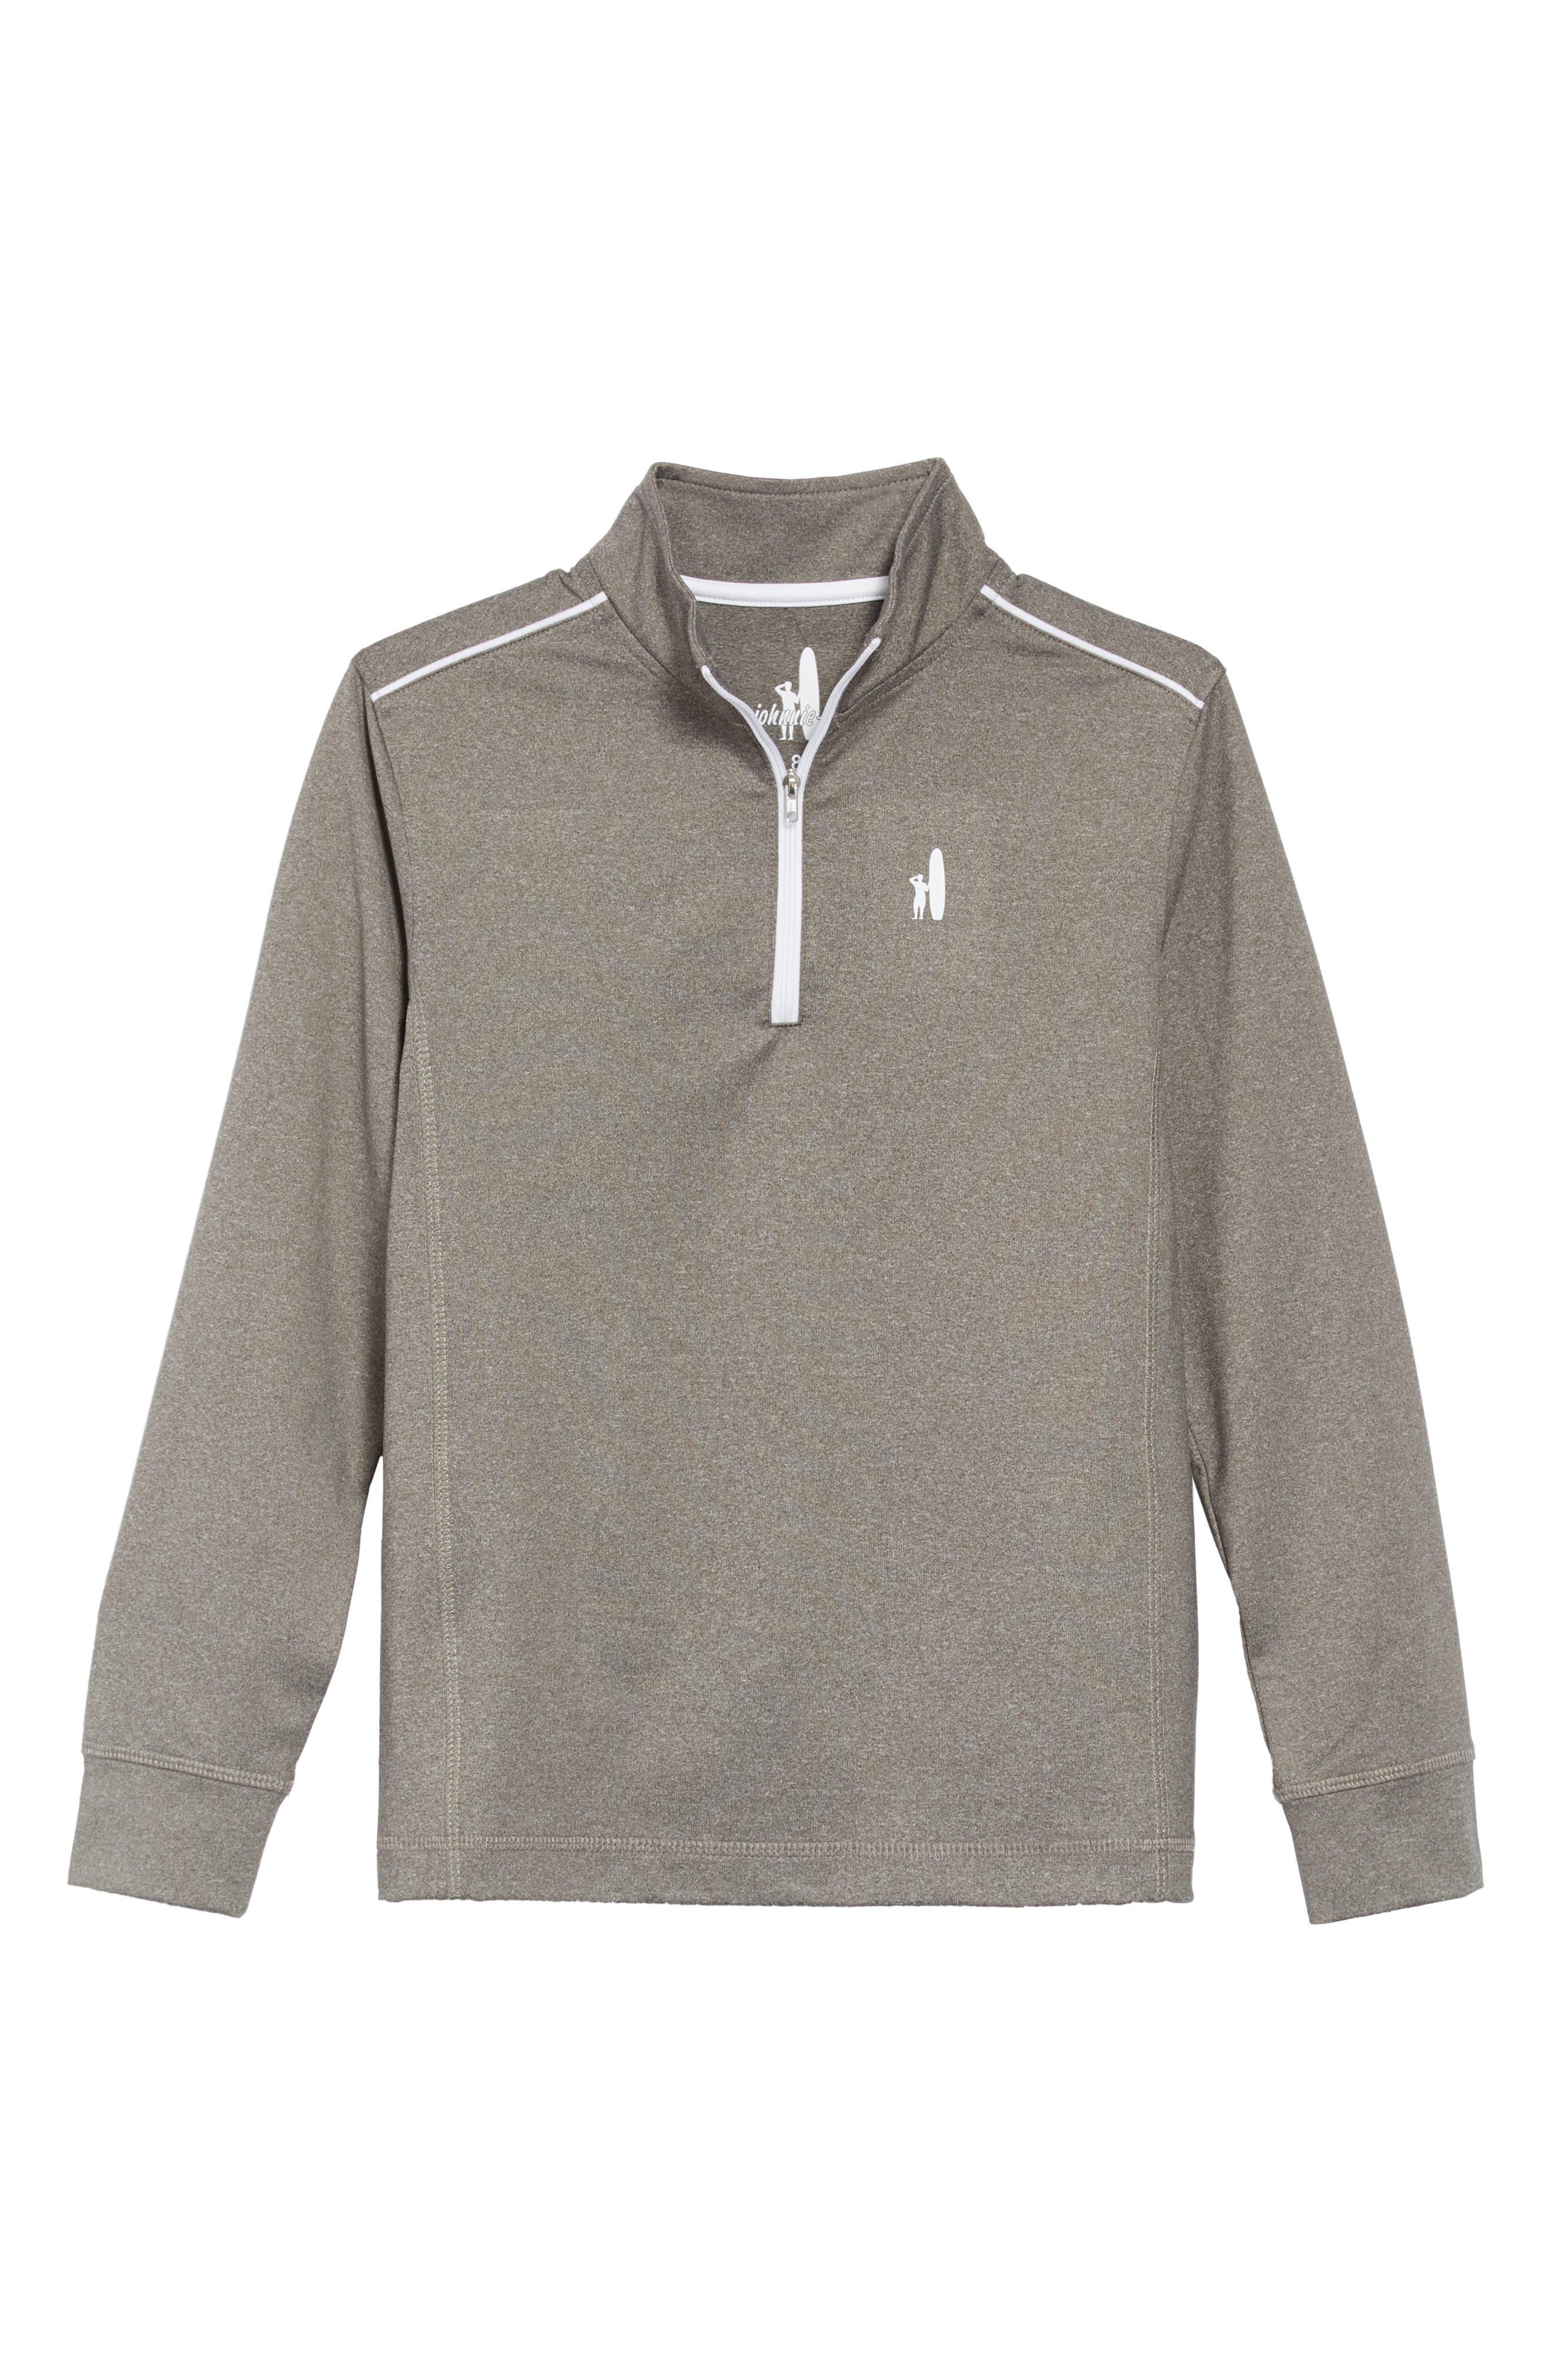 Boys JohnnieO Lammie Quarter Zip Pullover Size 16  Red